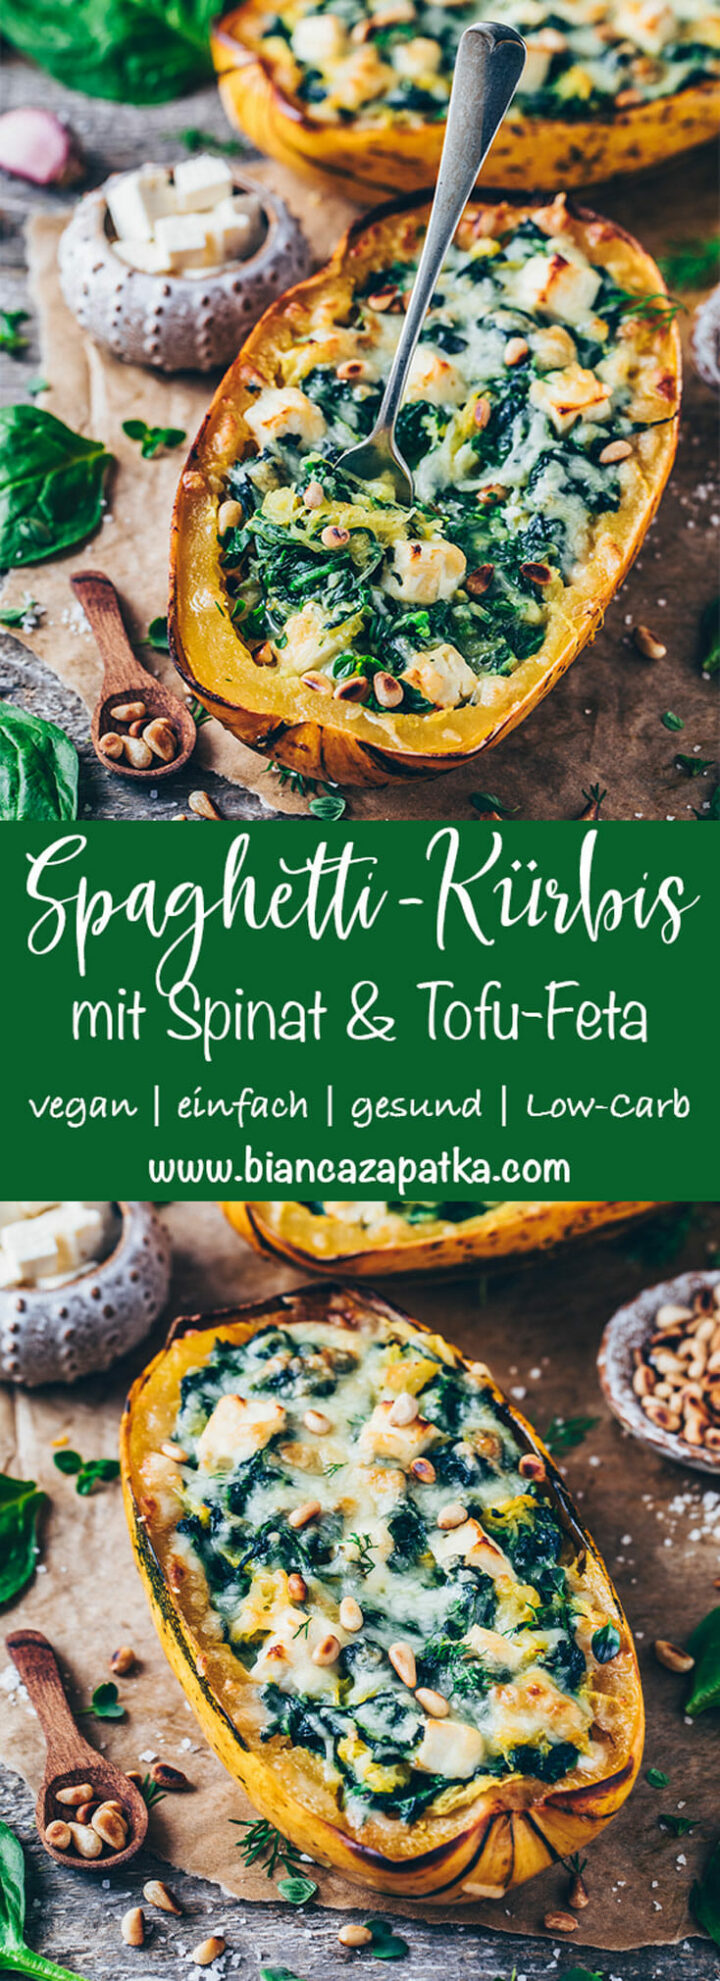 Spaghetti Kürbis mit Spinat und Feta Käse